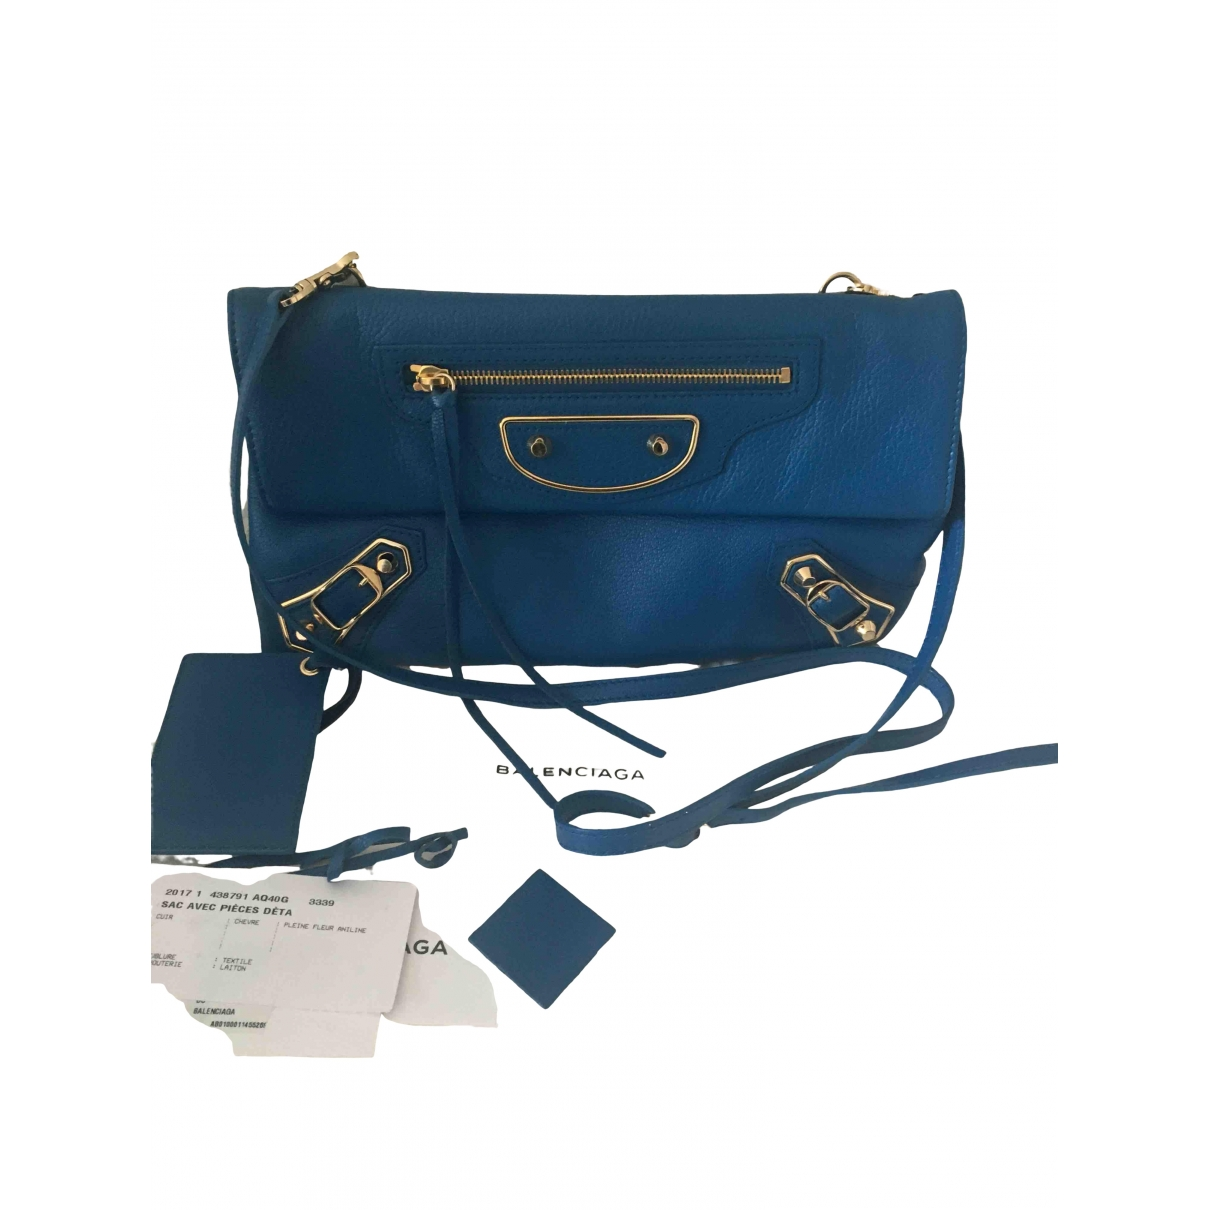 Balenciaga - Sac a main Envelop pour femme en cuir - bleu